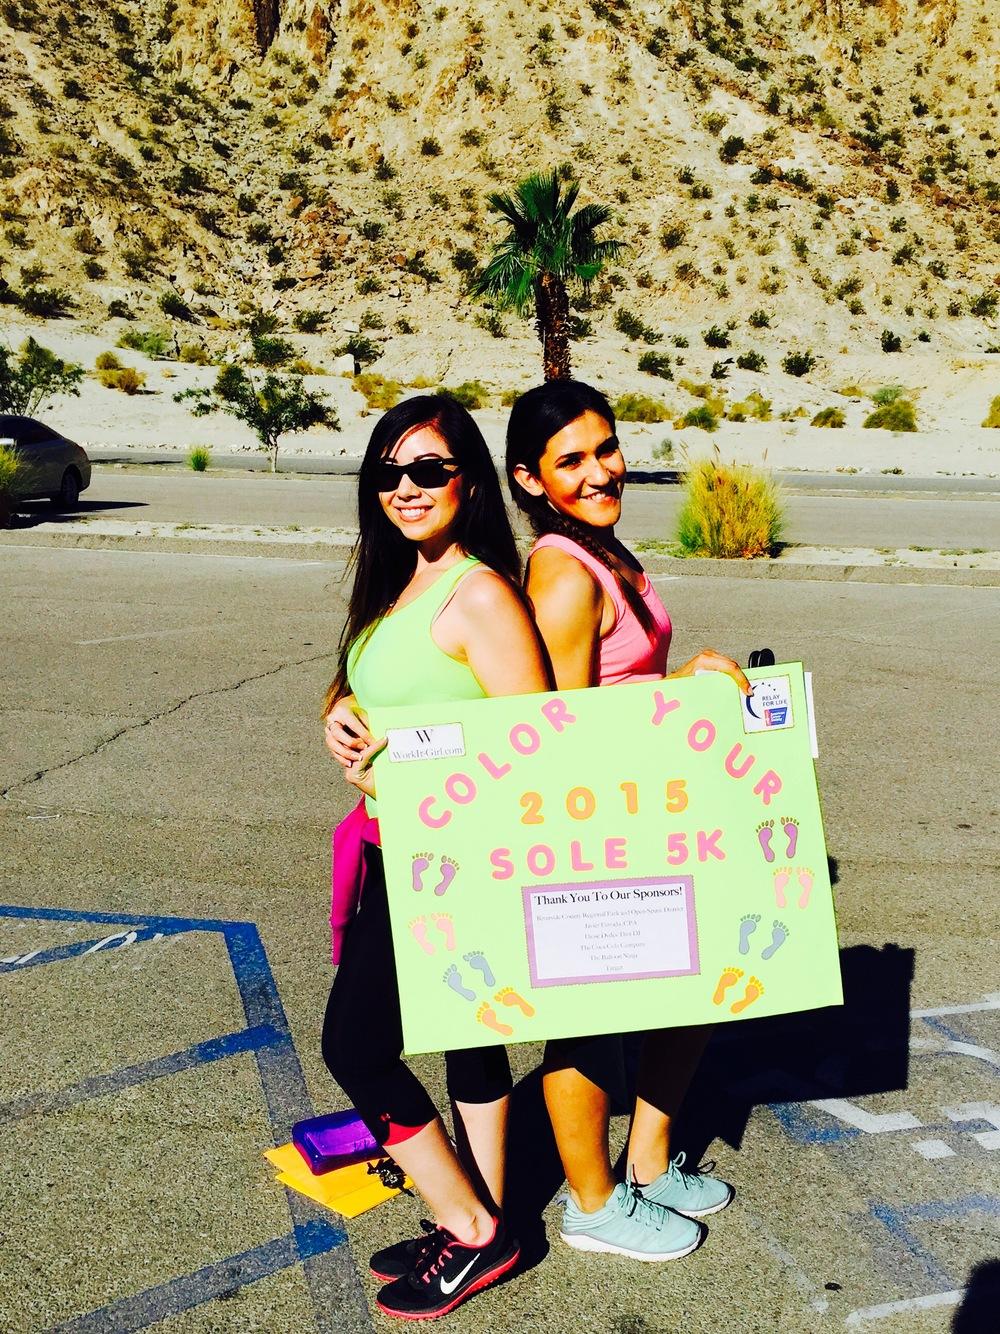 Color Your Sole 5k- A WorkIt-Girl.com Event @ Lake Cahuilla, La Quinta, CA.